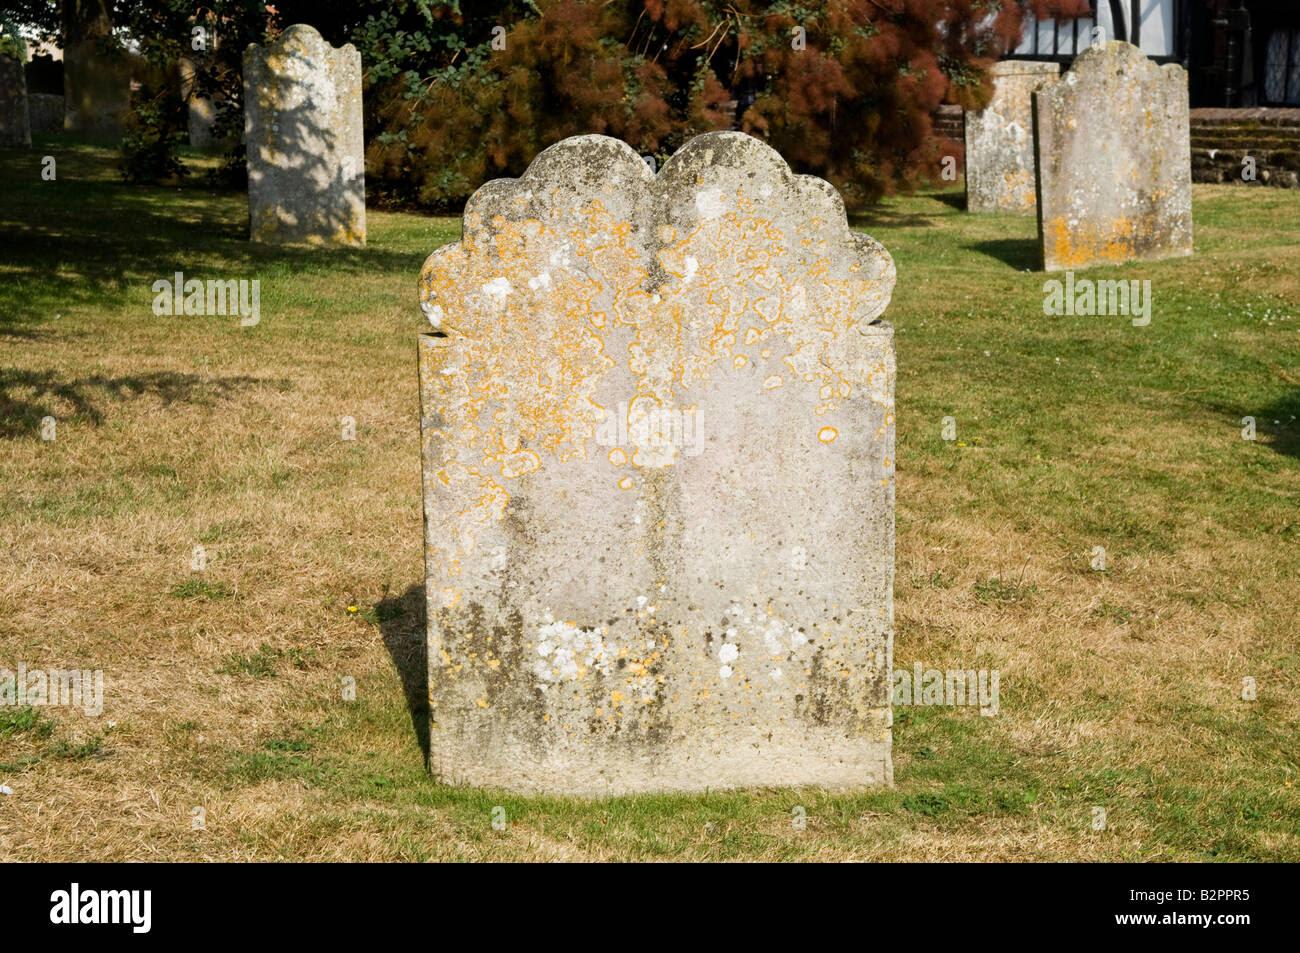 Blank Gravestone In Churchyard Stock Photo, Royalty Free Image ...